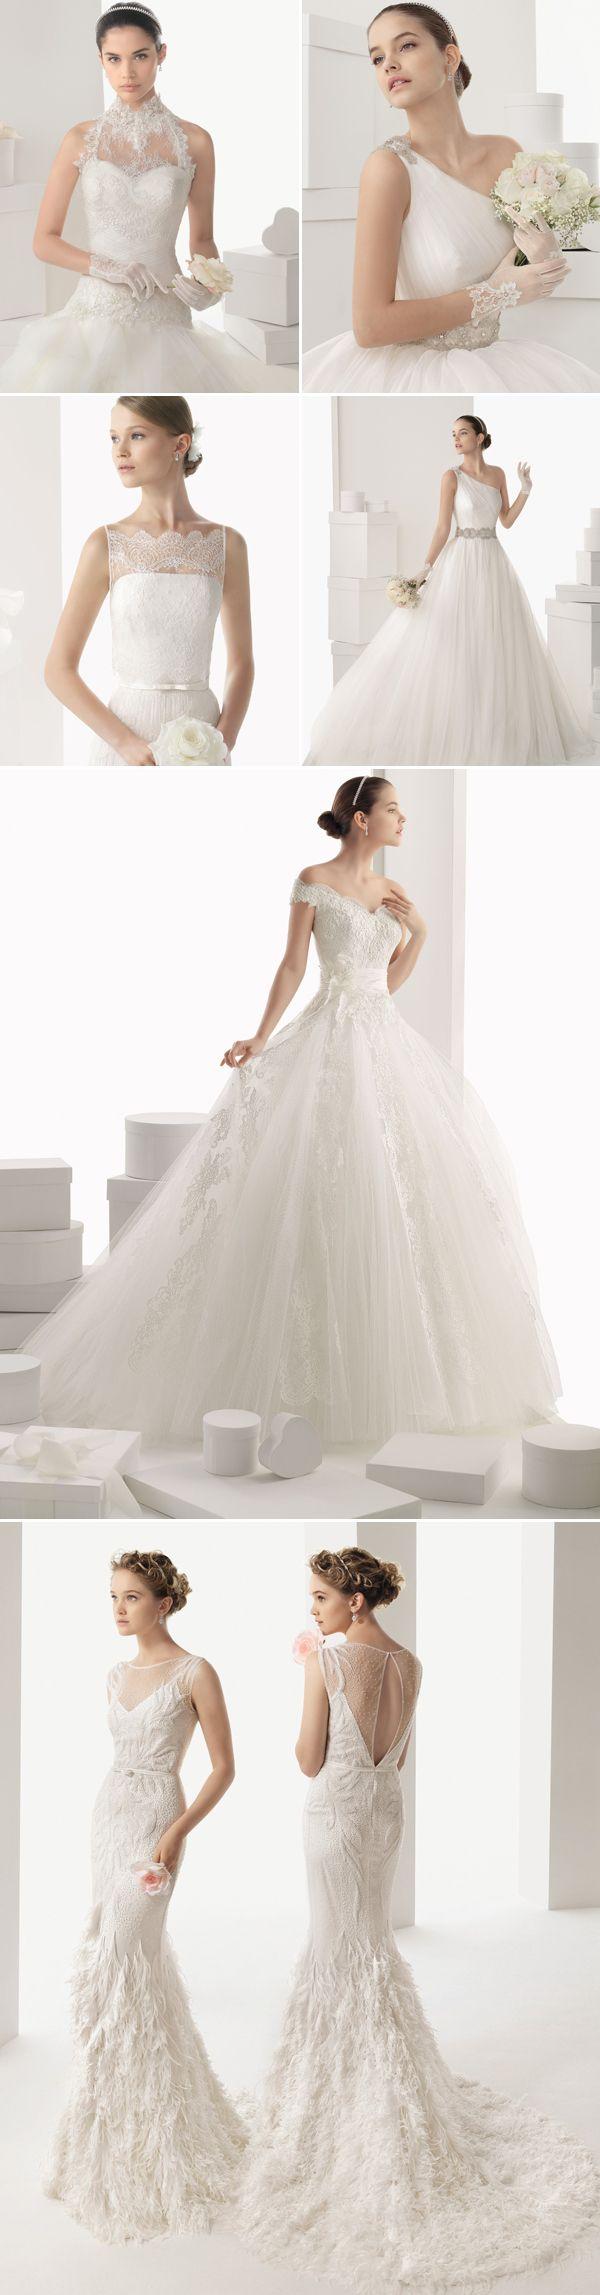 27 Elegant 2014 Bridal Gowns | Pinterest | Rosa clara, Bridal gowns ...